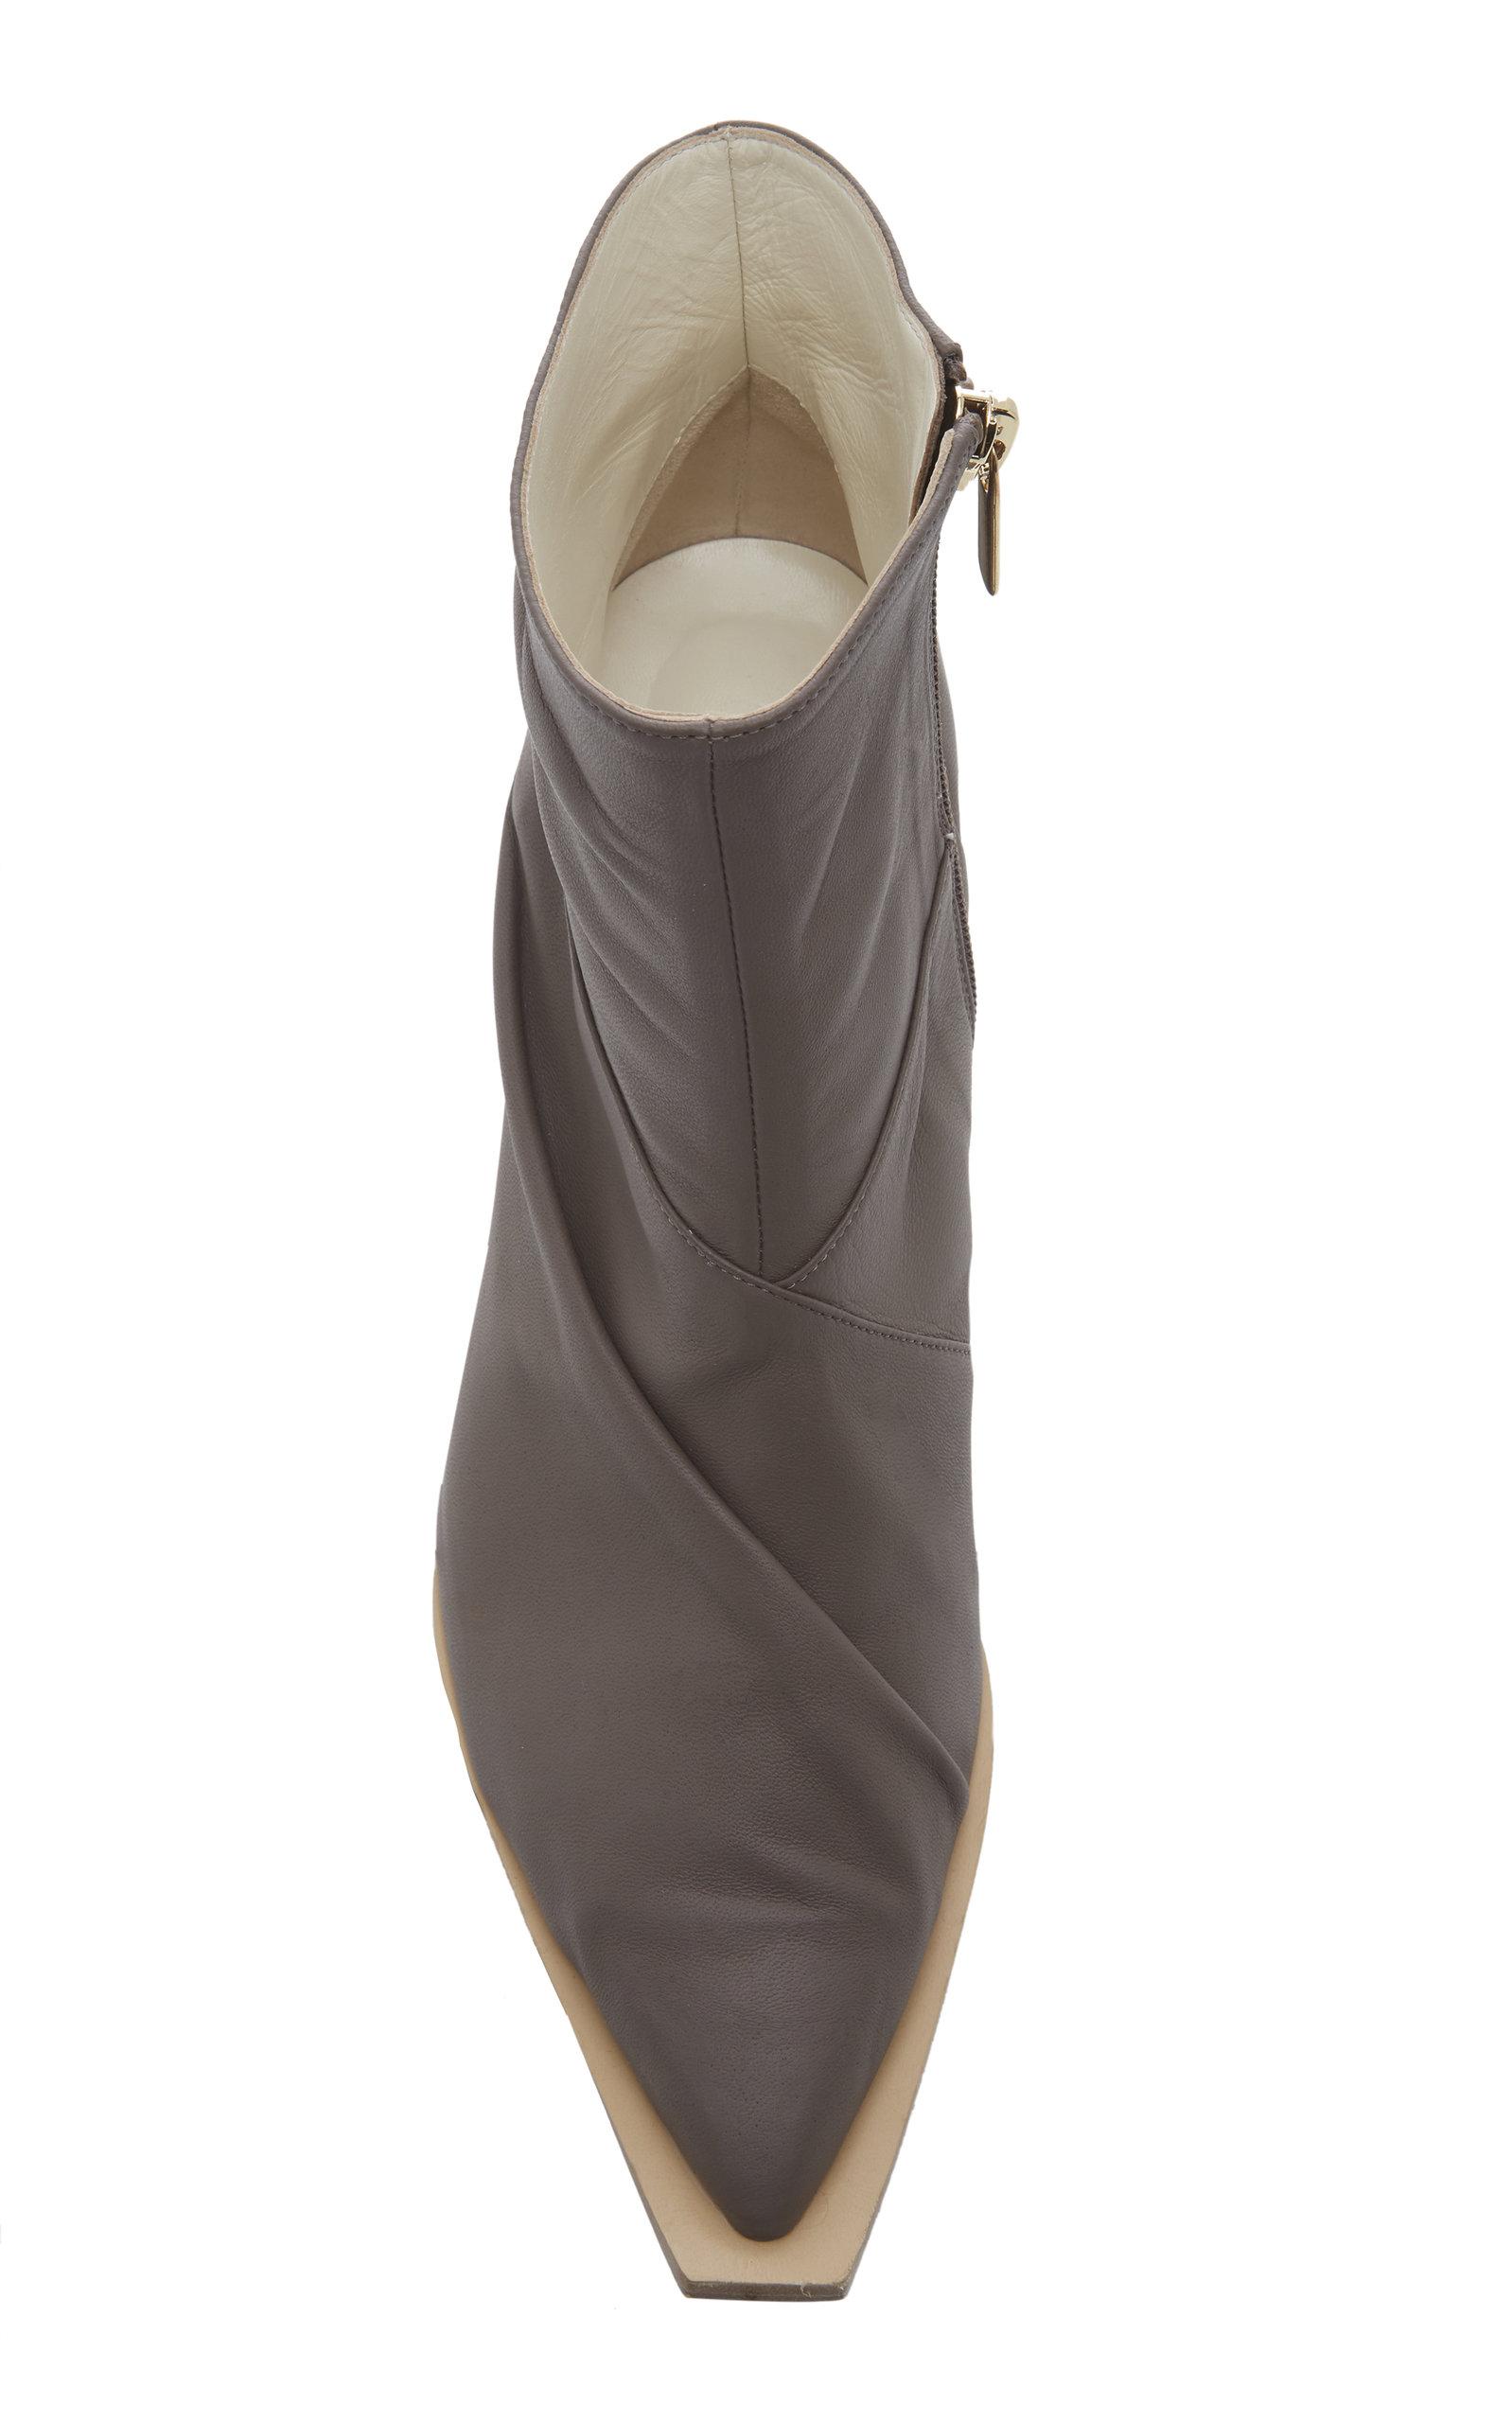 663f96eedf5 TibiCato Ankle Boots. CLOSE. Loading. Loading